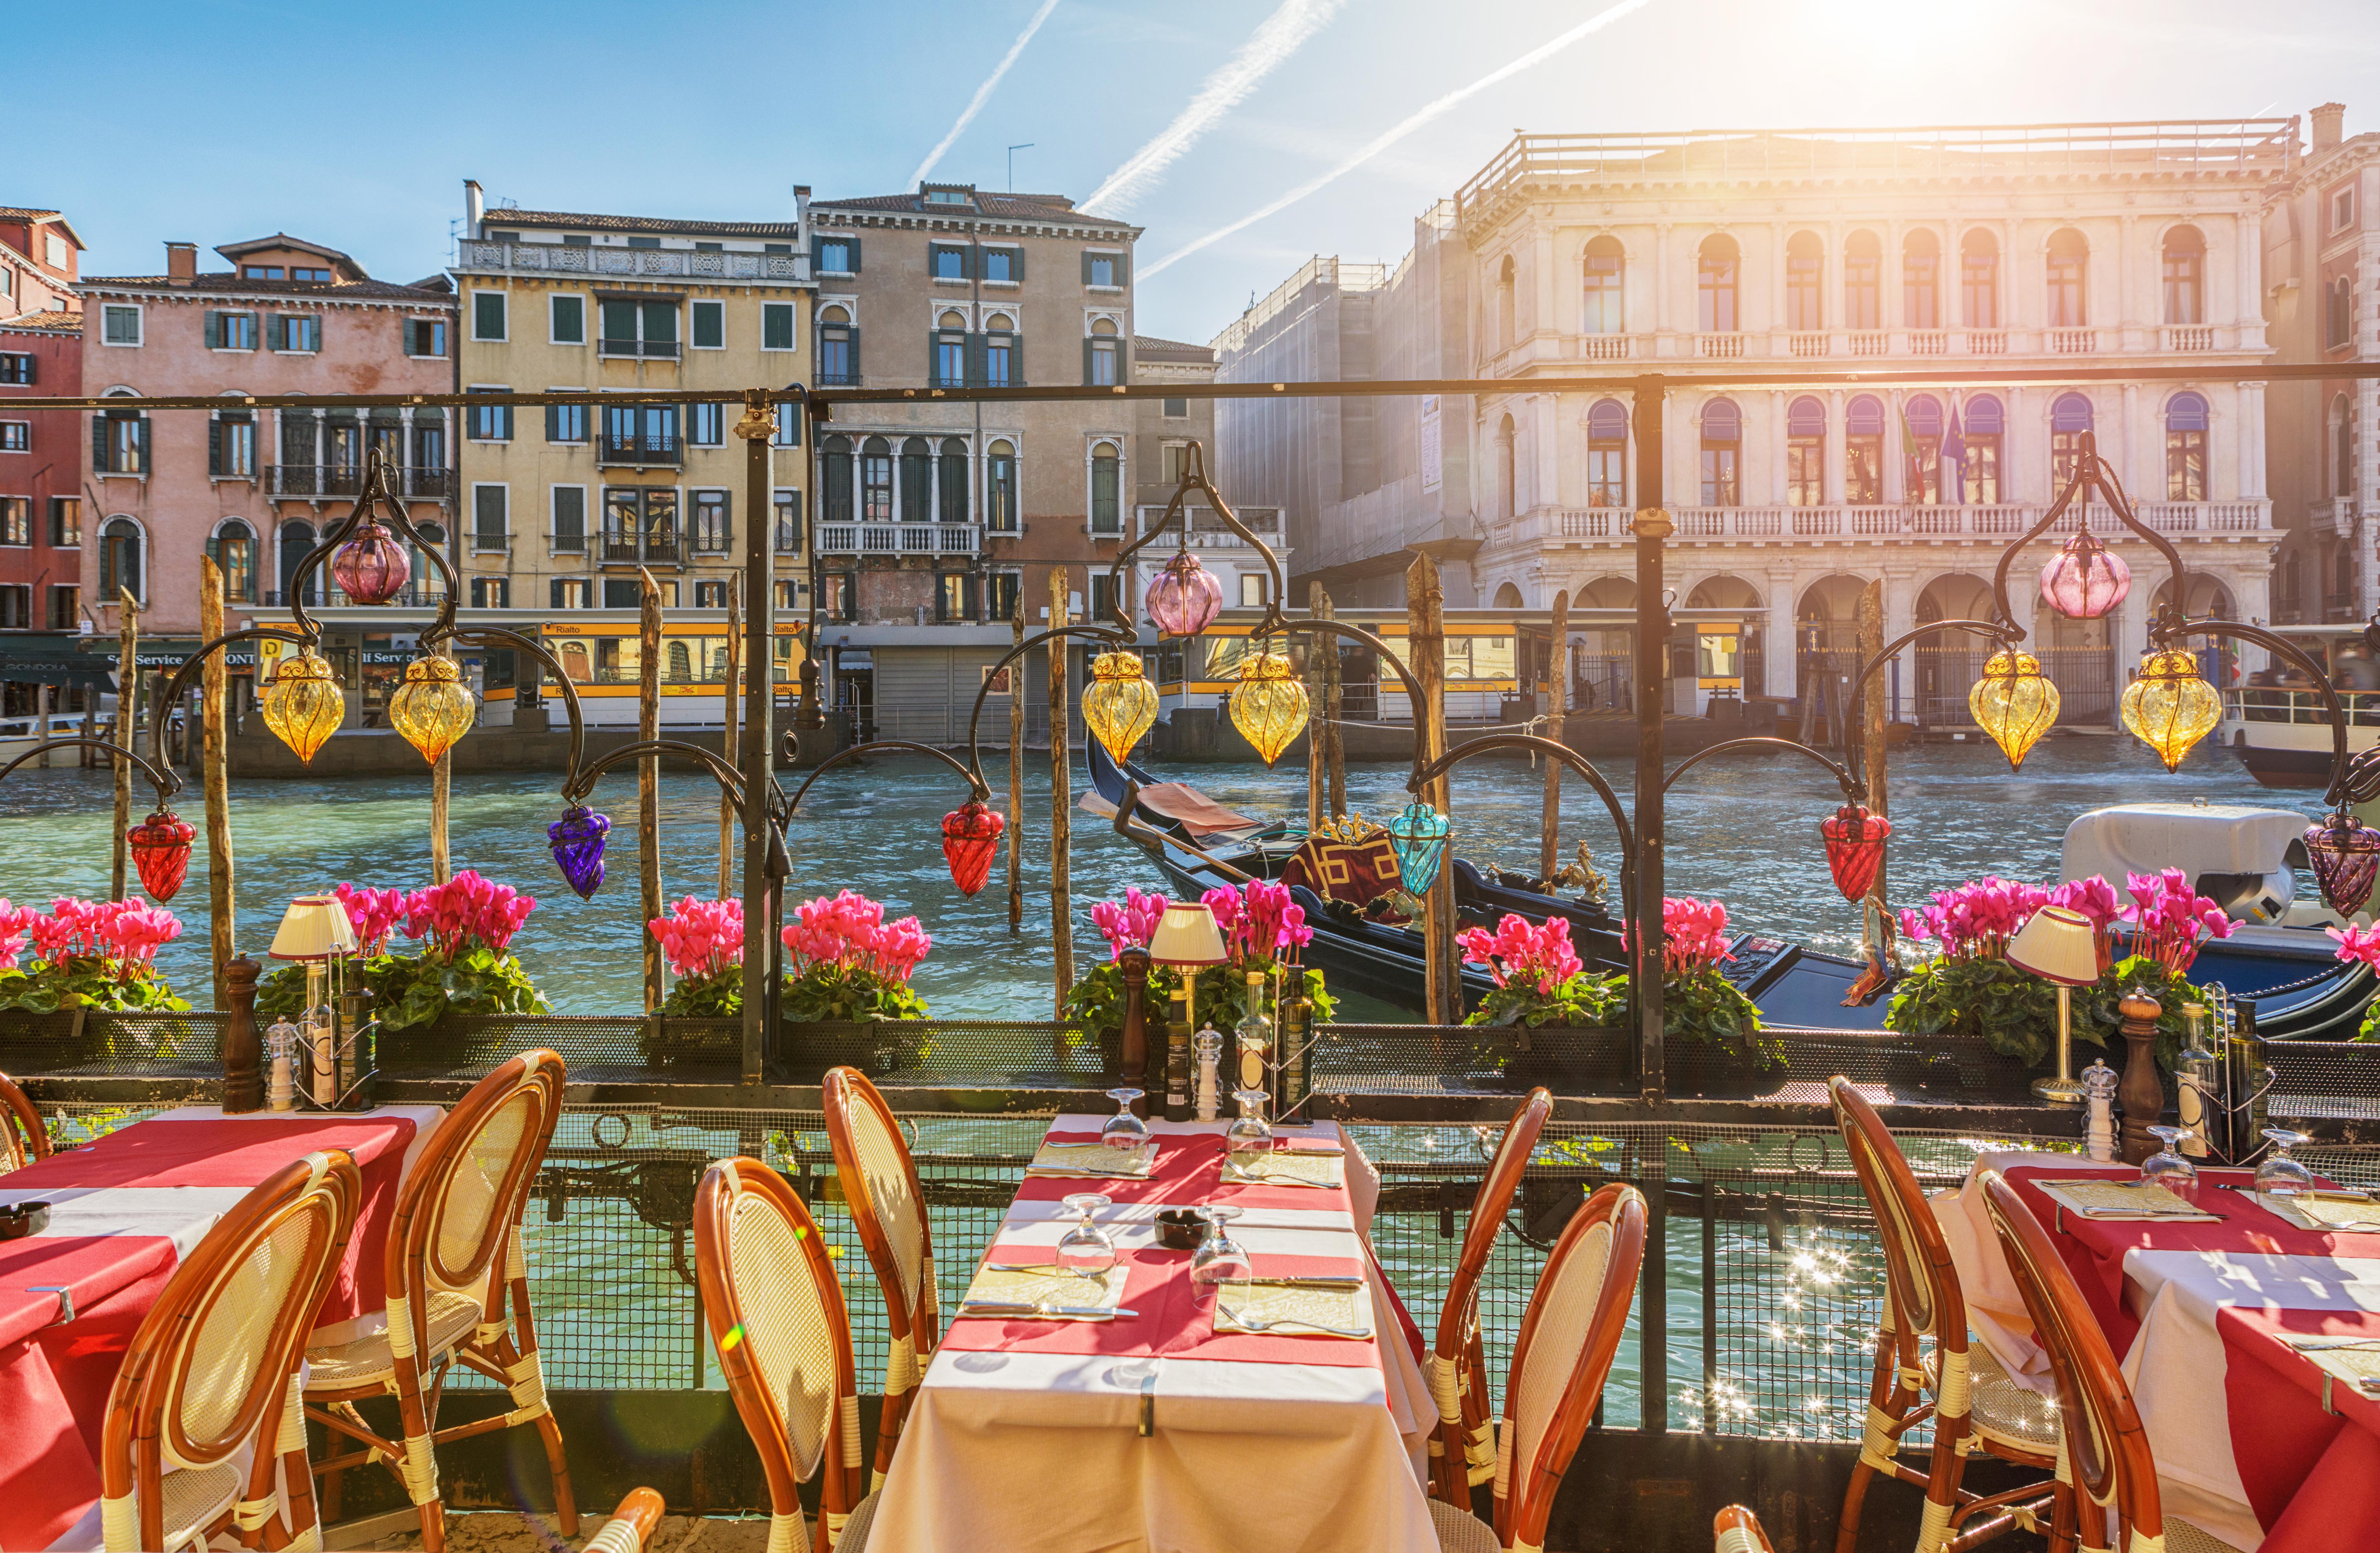 Restaurant Tables Near The Canal of Venice, Italy